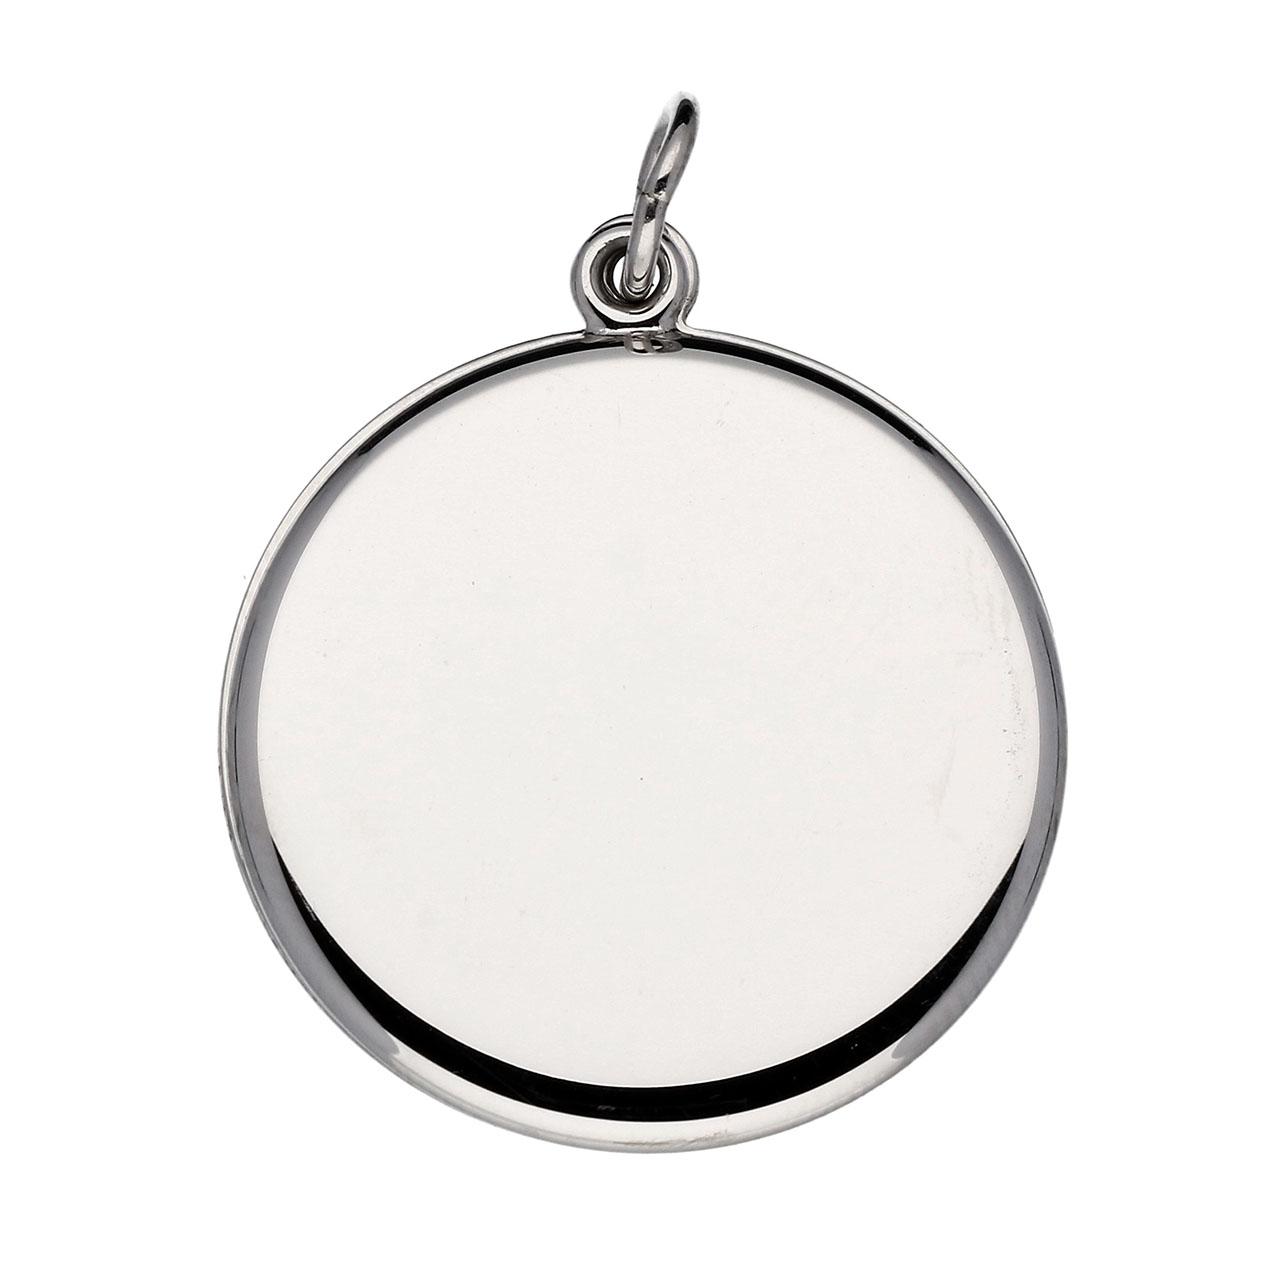 Lifetime Love Zilveren Hanger Medaillon Rond 22 mm 145.0120.00